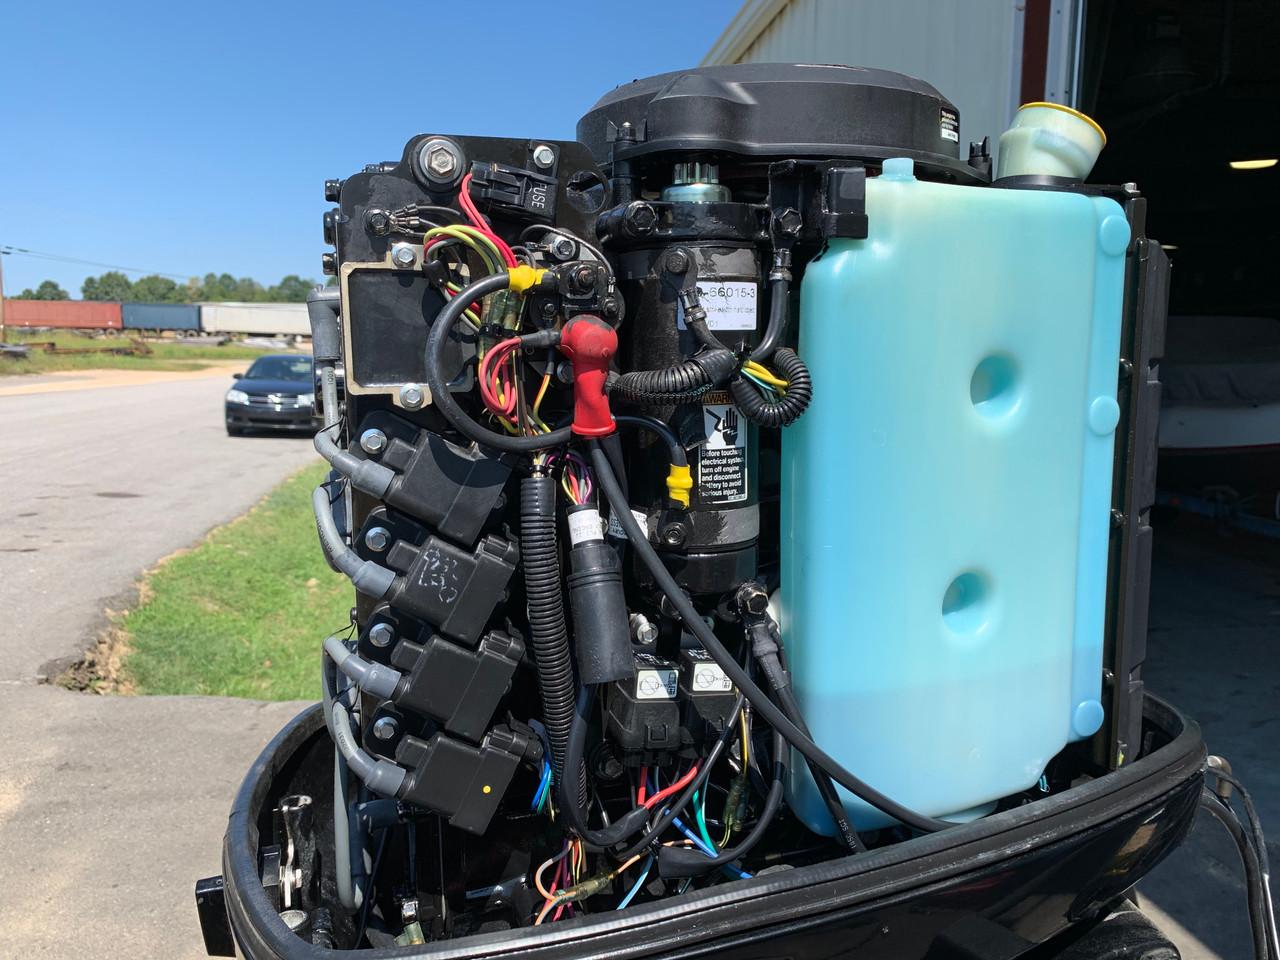 Mercury 125 Fuel Filter Fuse Box For Car Sales For Wiring Diagram Schematics